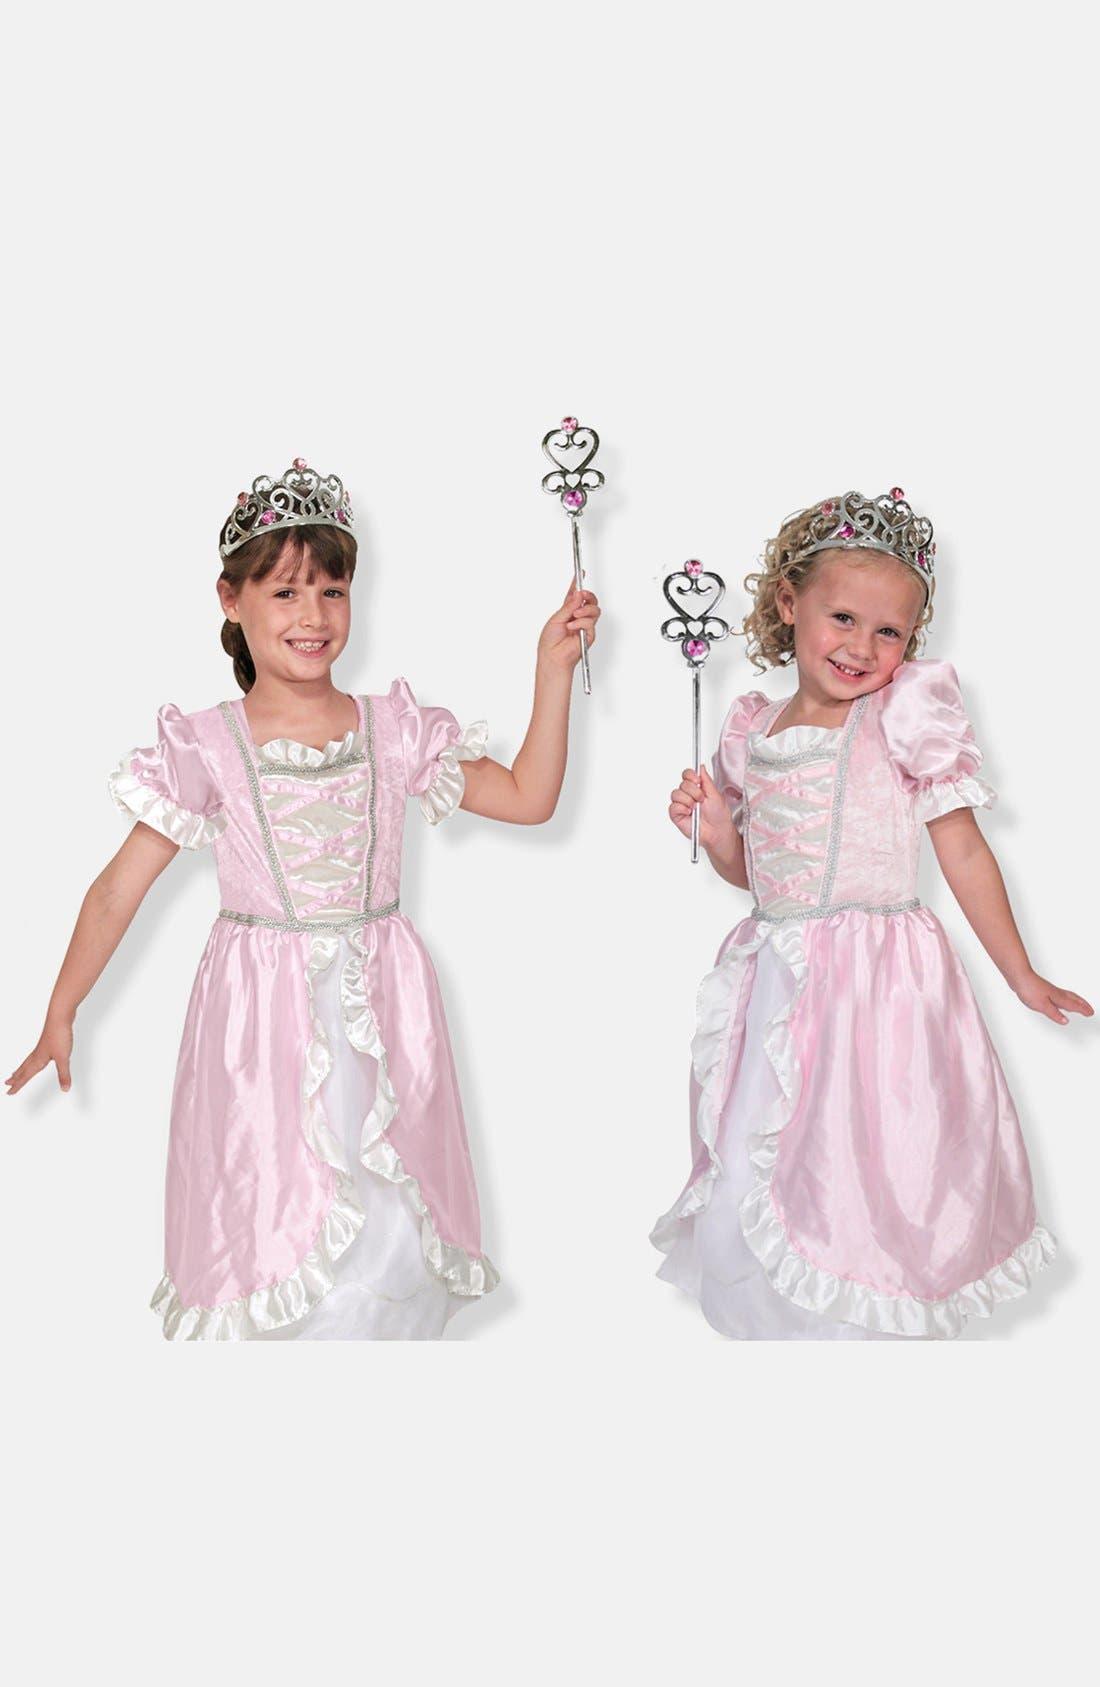 Personalized Princess Costume,                             Main thumbnail 1, color,                             650